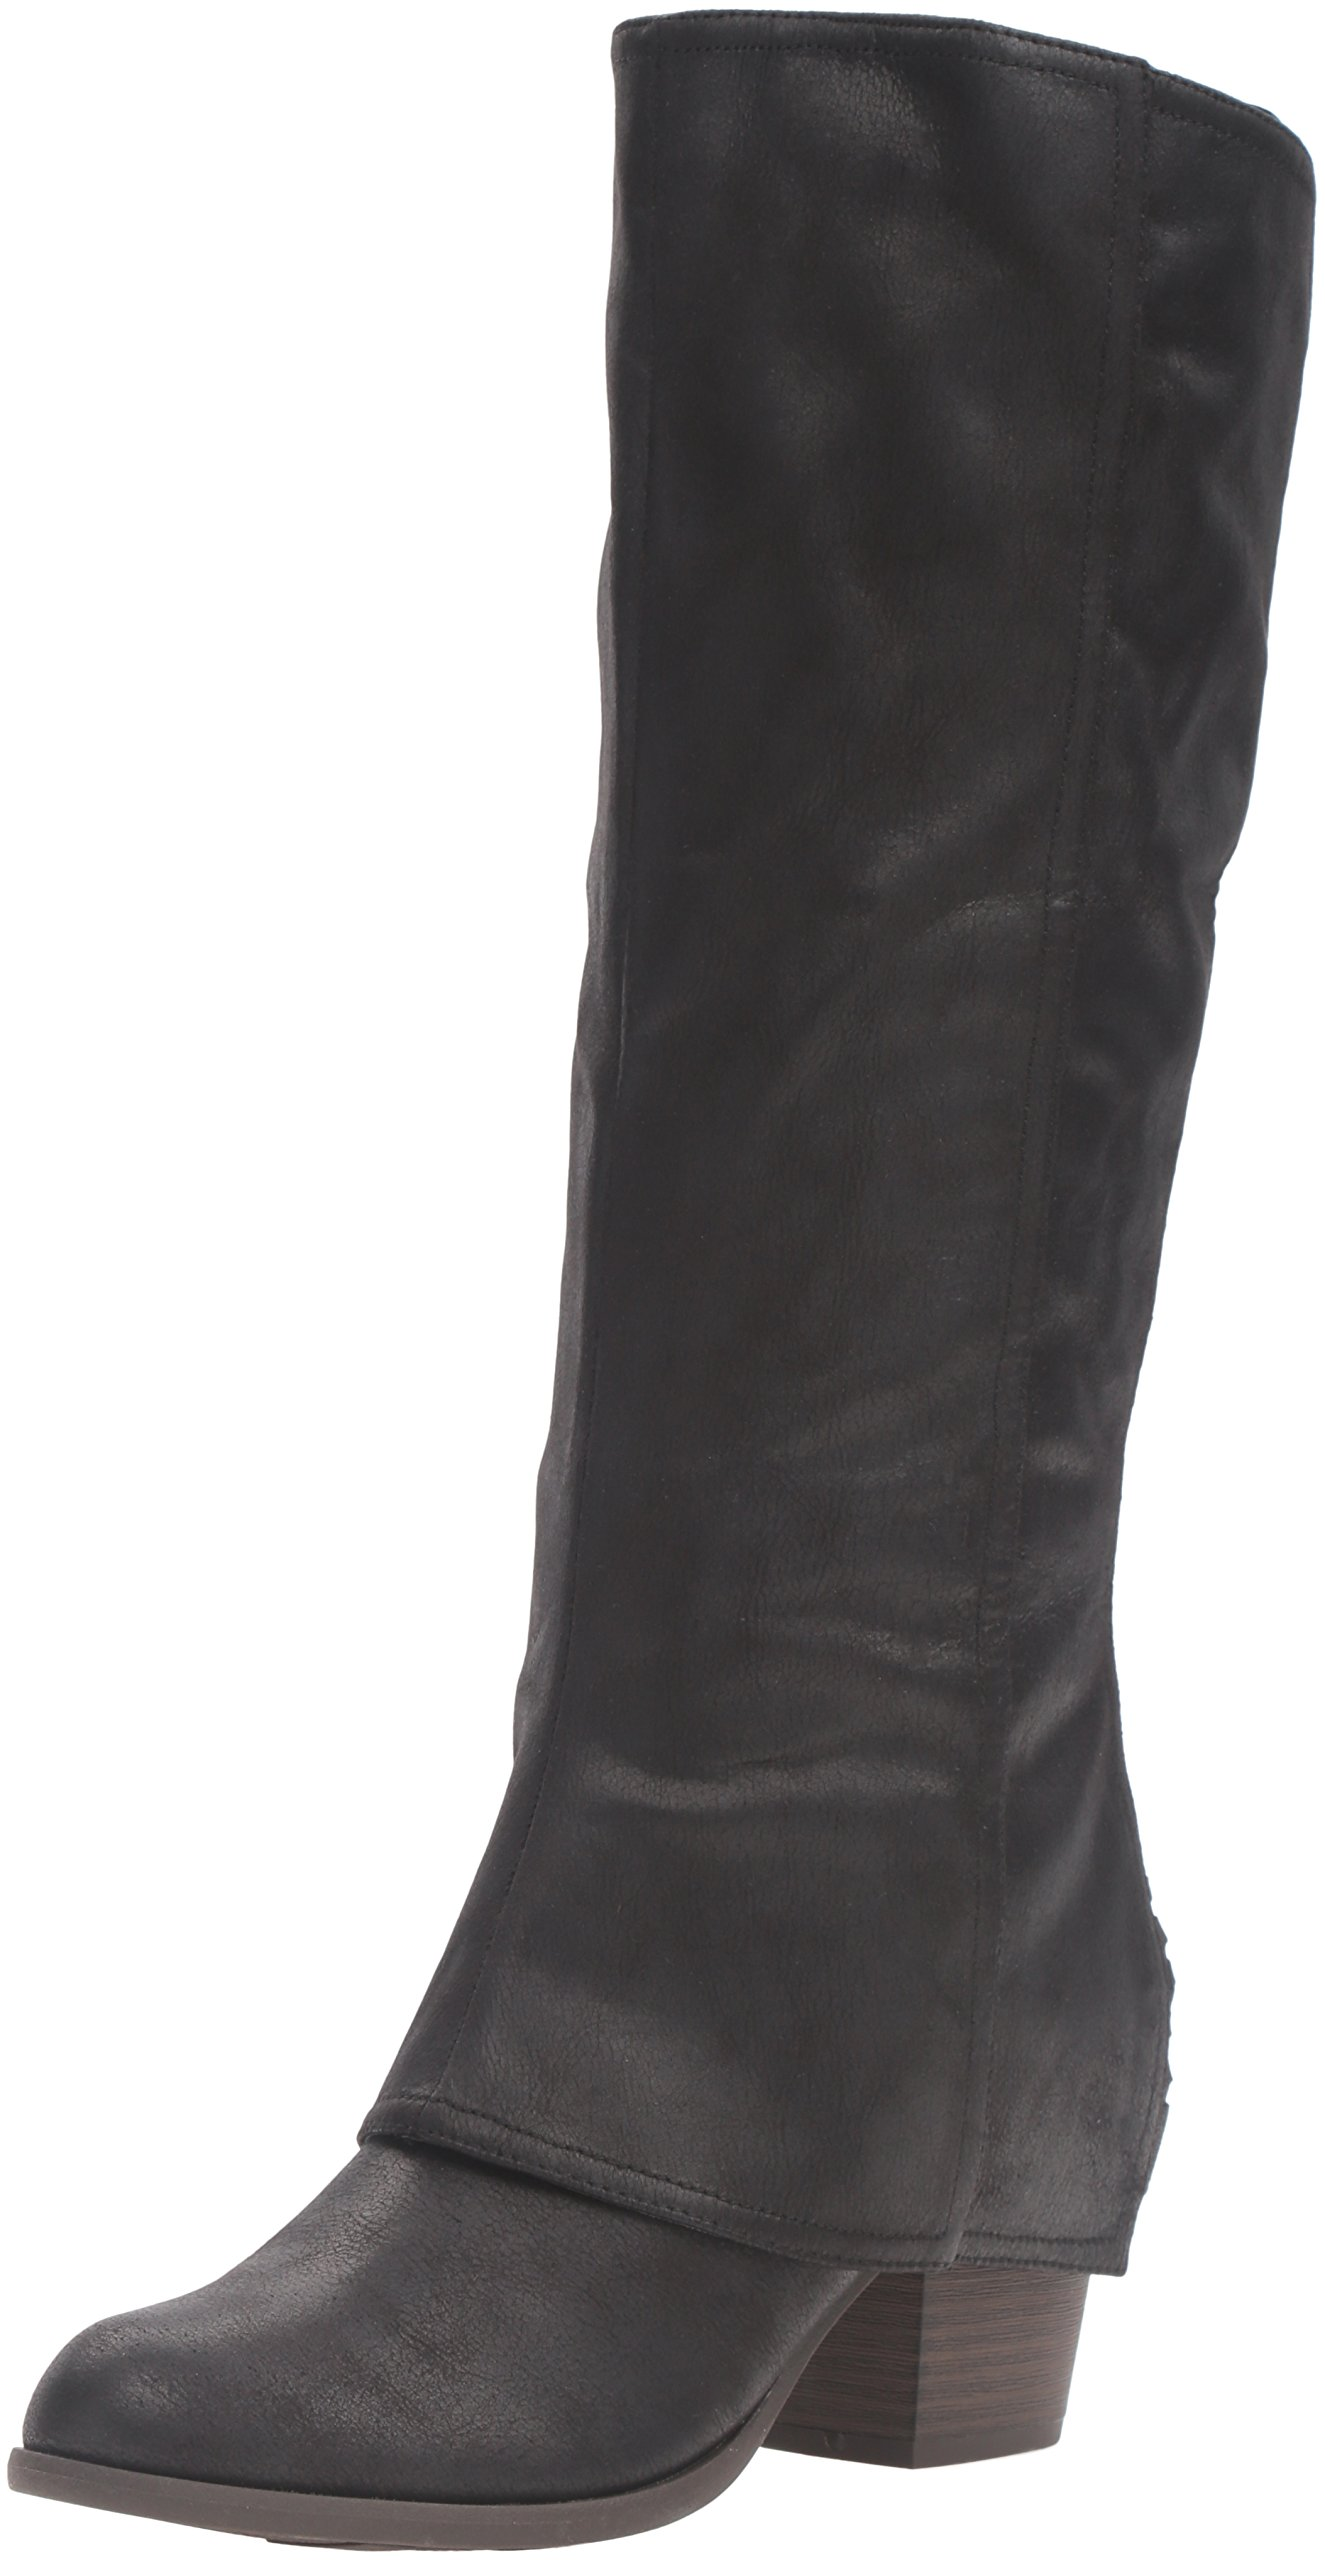 Fergalicious Women's Lundry Western Boot, Black, 8 M US